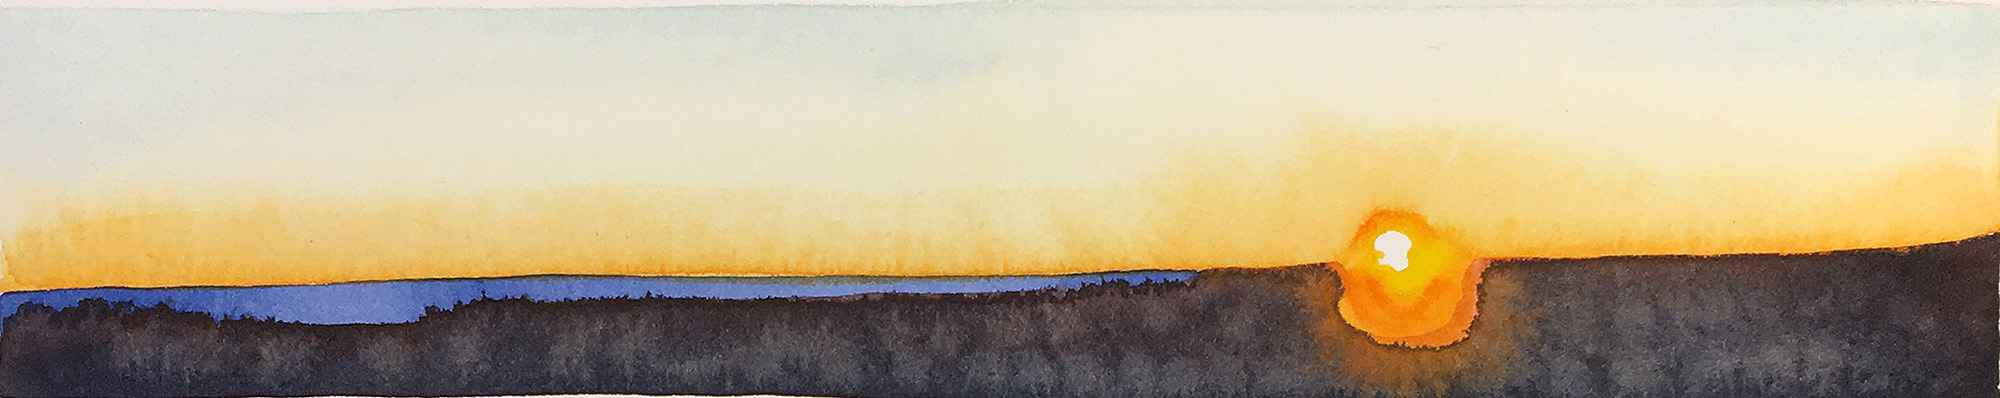 Morning Turn III by  Lisa Grossman - Masterpiece Online